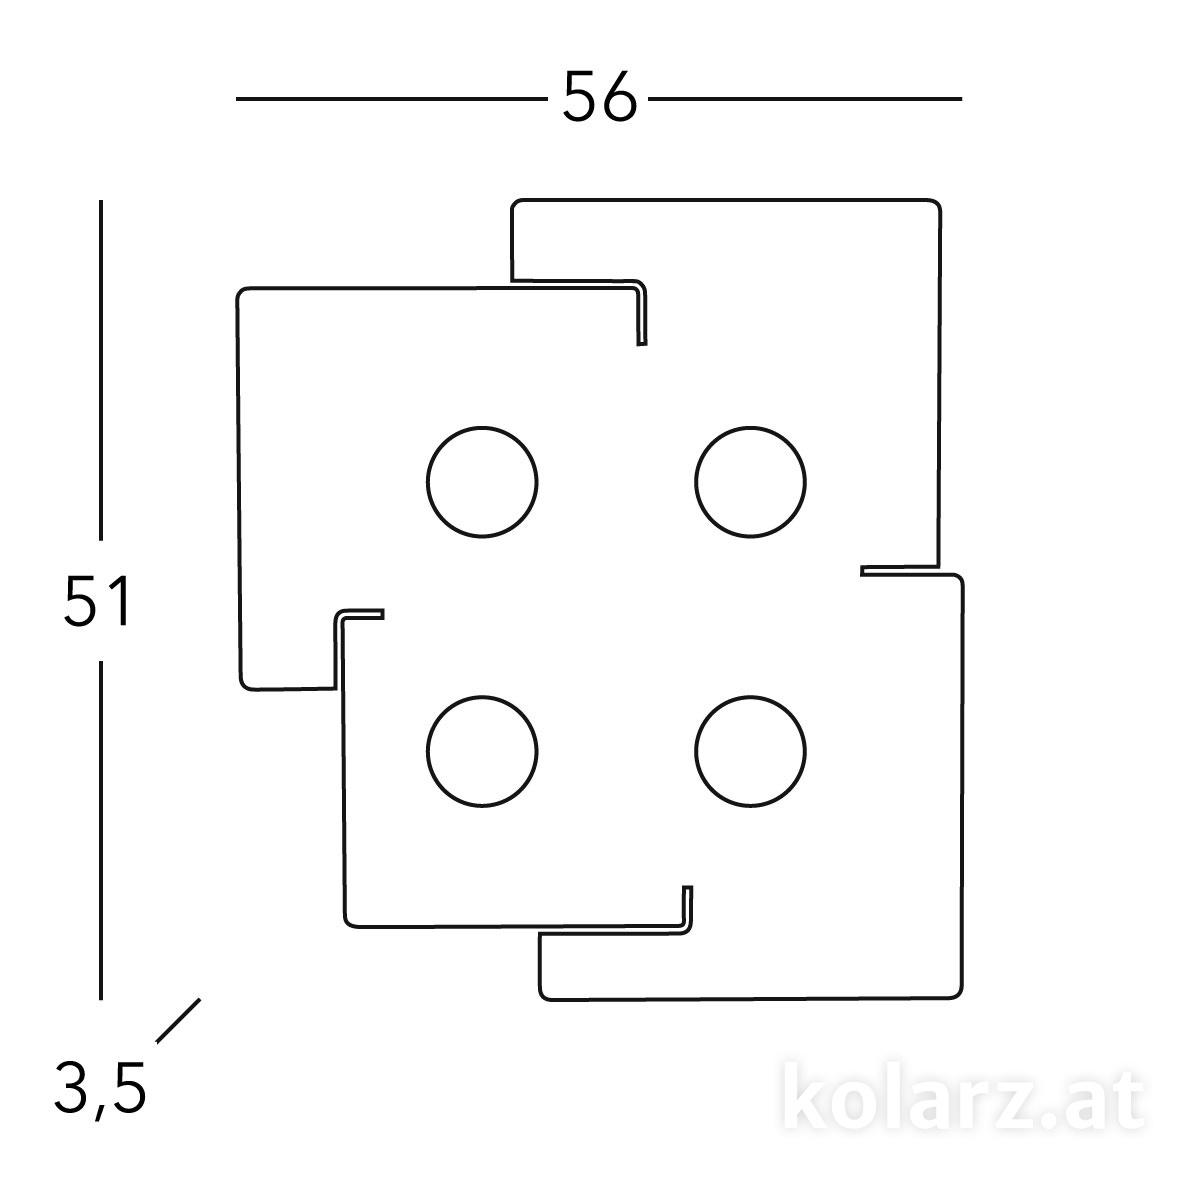 A1337-14-1-Cu-s1.jpg